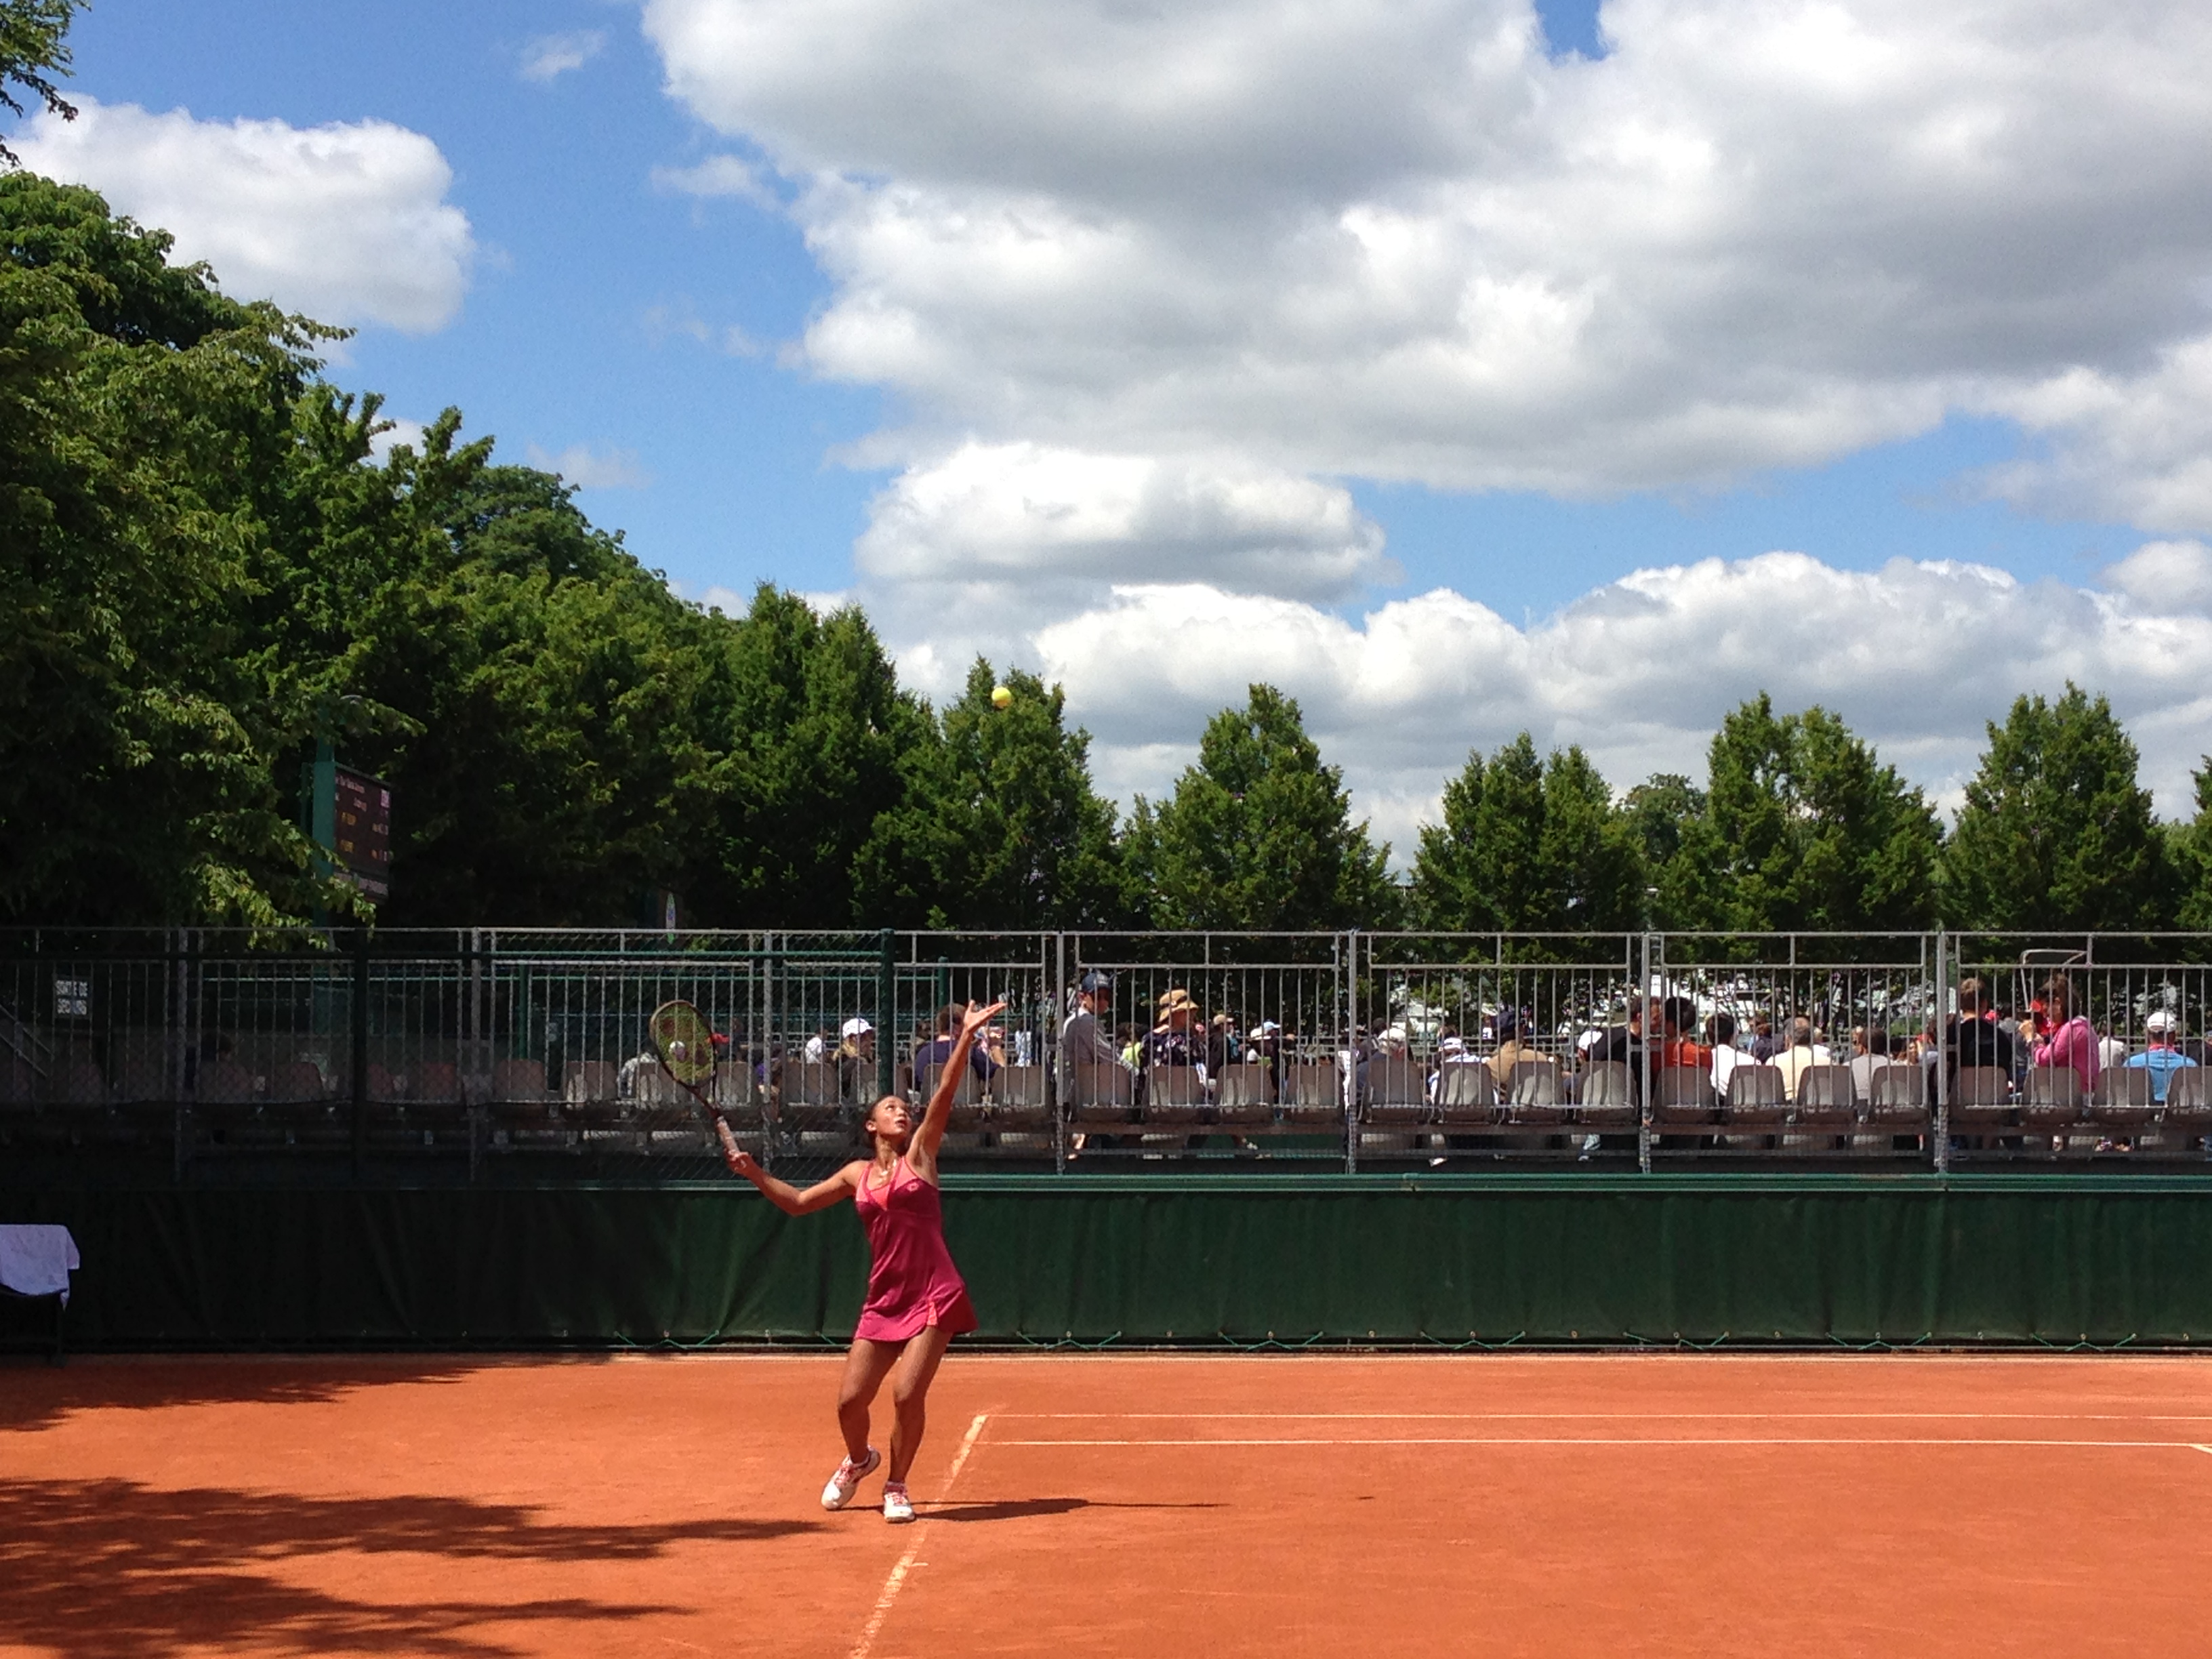 Sandra Samir serving ball at the second round in Roland Garros 2013 (Photo Courtesy of Sandra Samir)